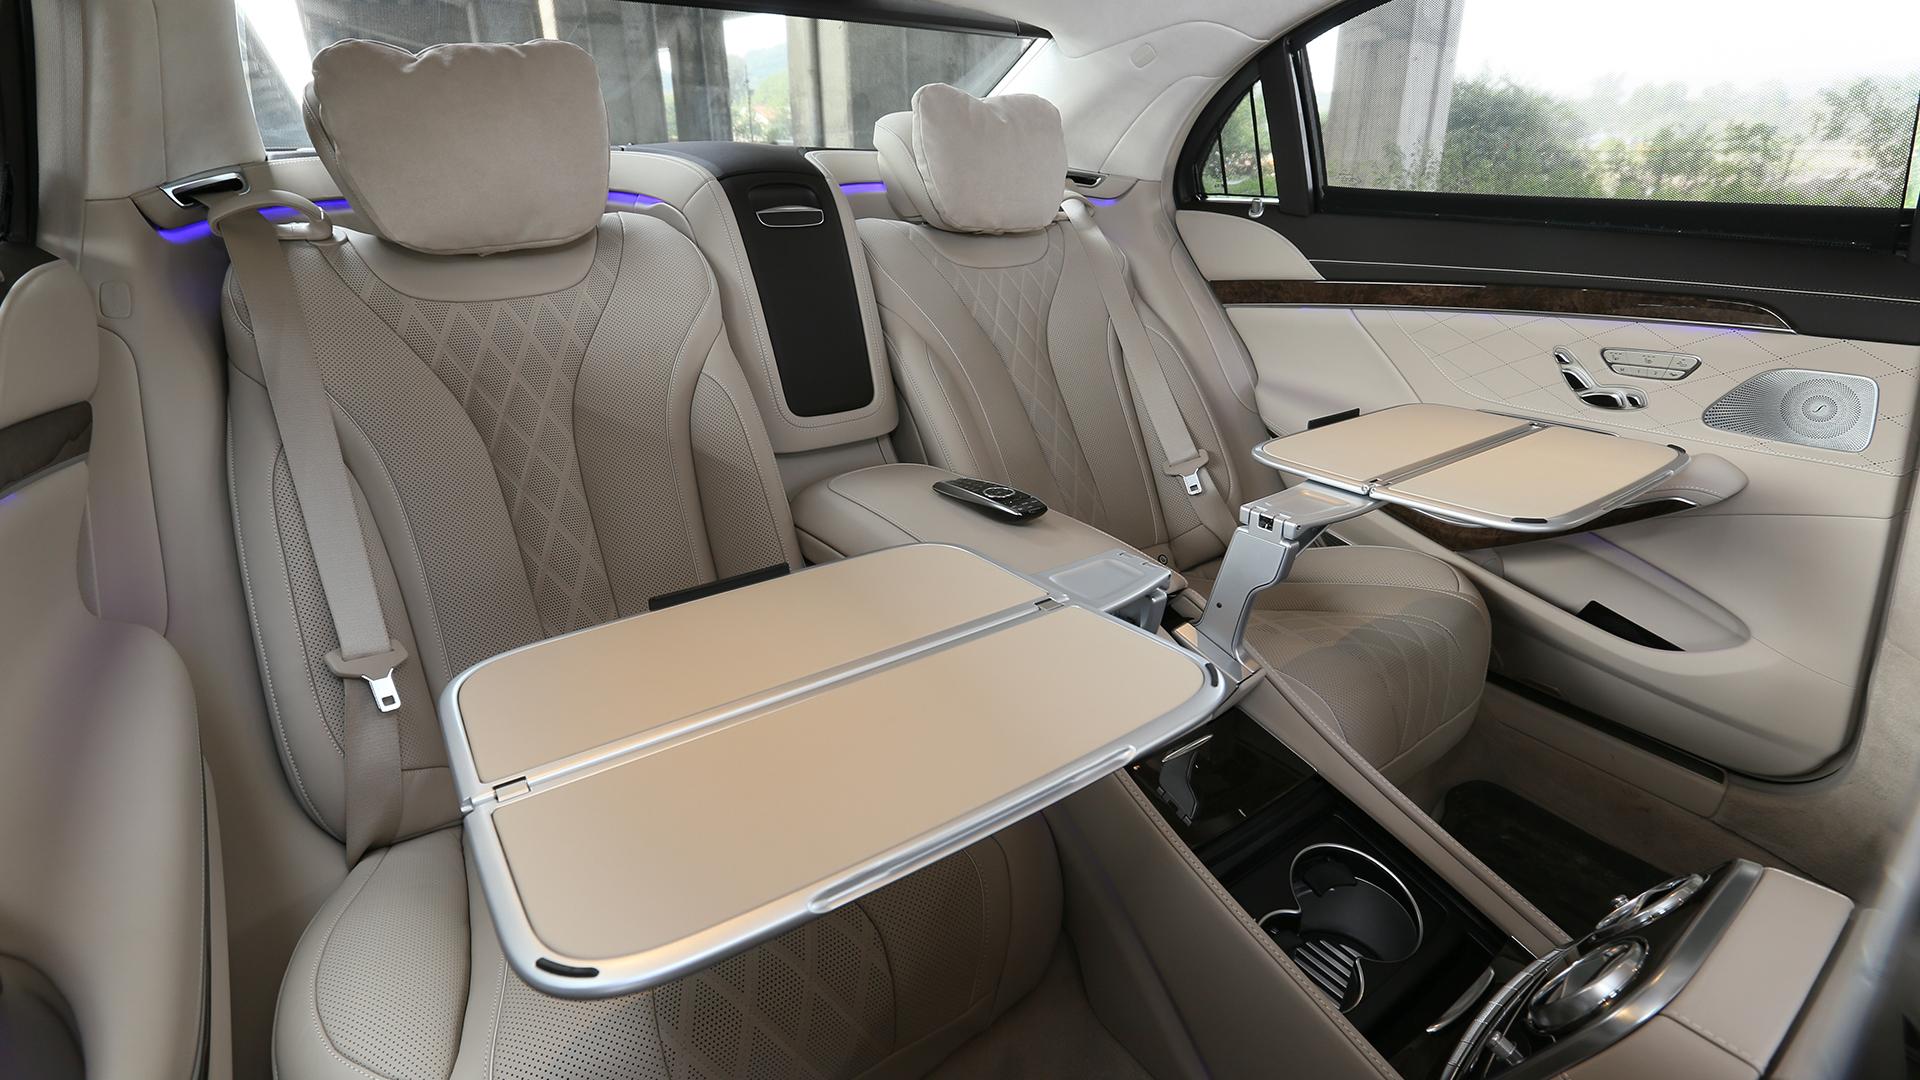 Mercedesbenz SLK55 2013 AMG Interior